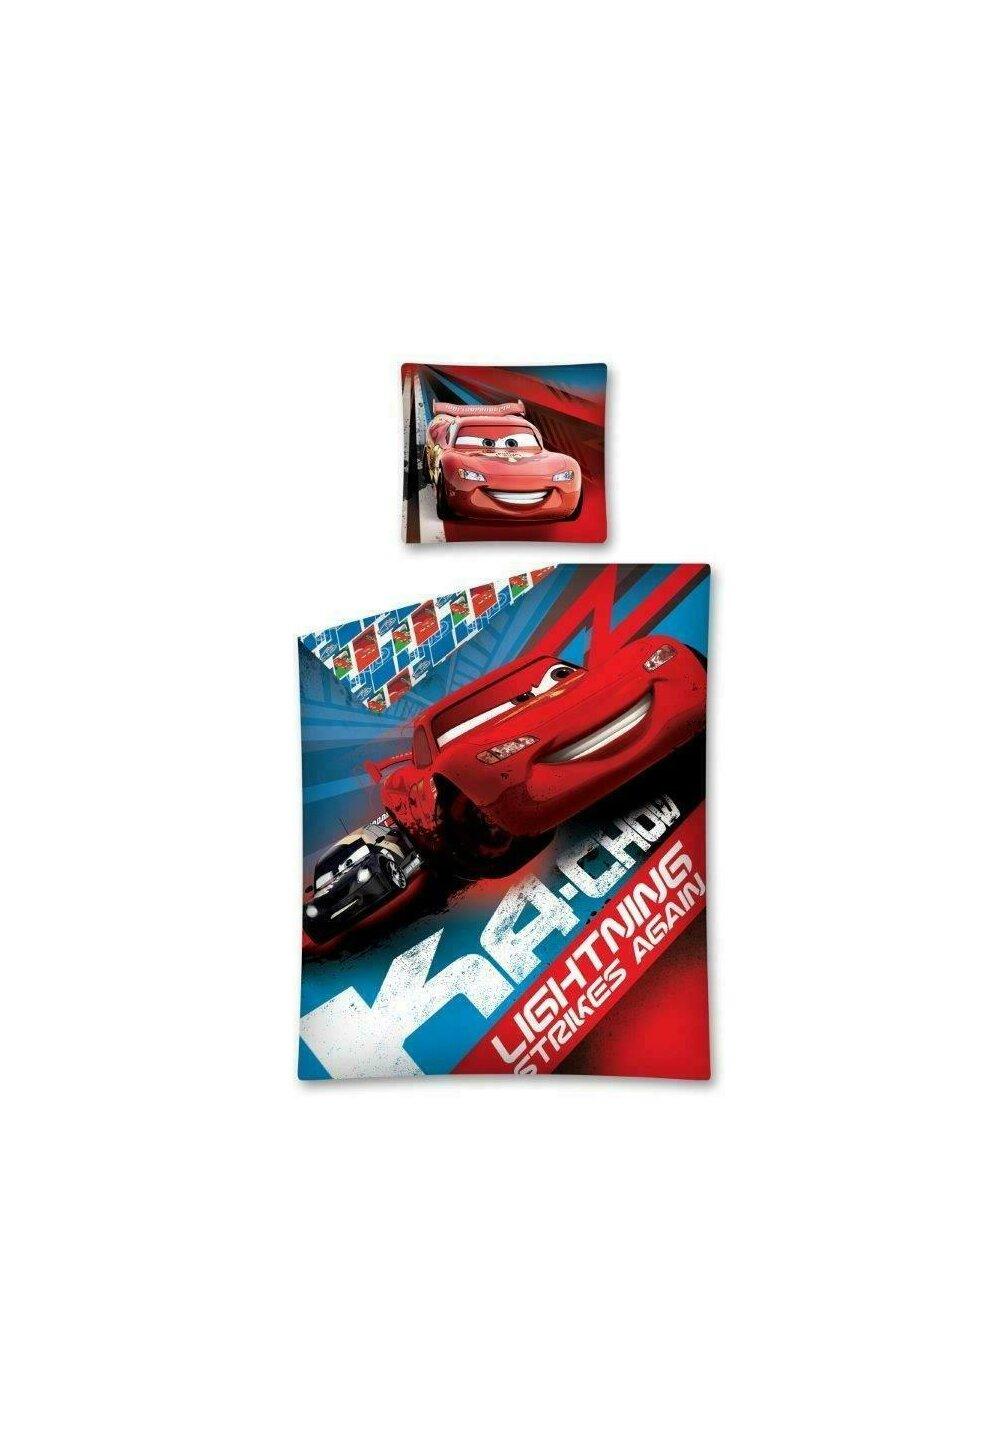 Lenjerie pat, Cars rosu cu albastru,140x200 cm imagine